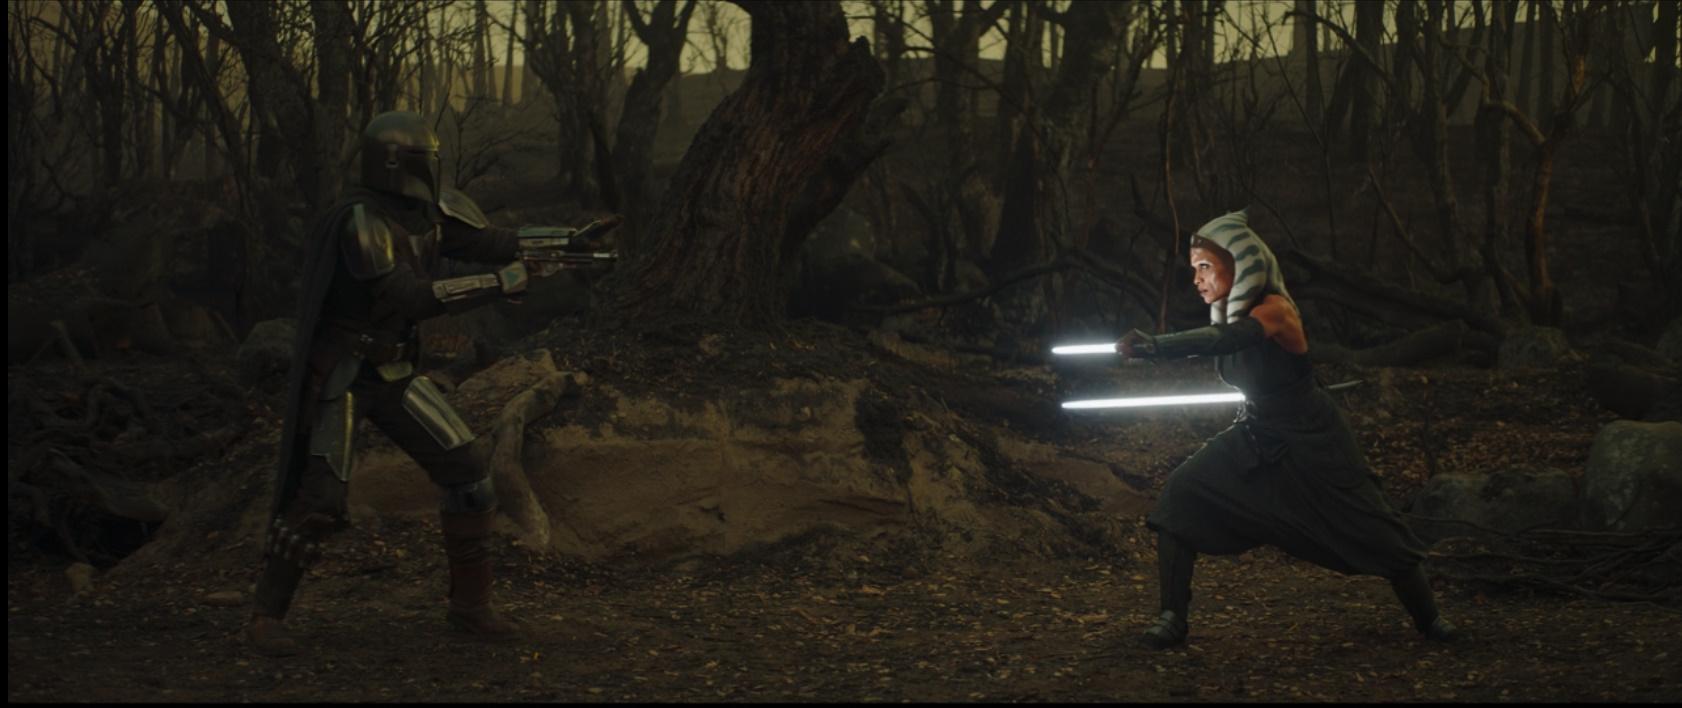 The Mandalorian Episode 13-The Jedi, Mando and Jedi Meet